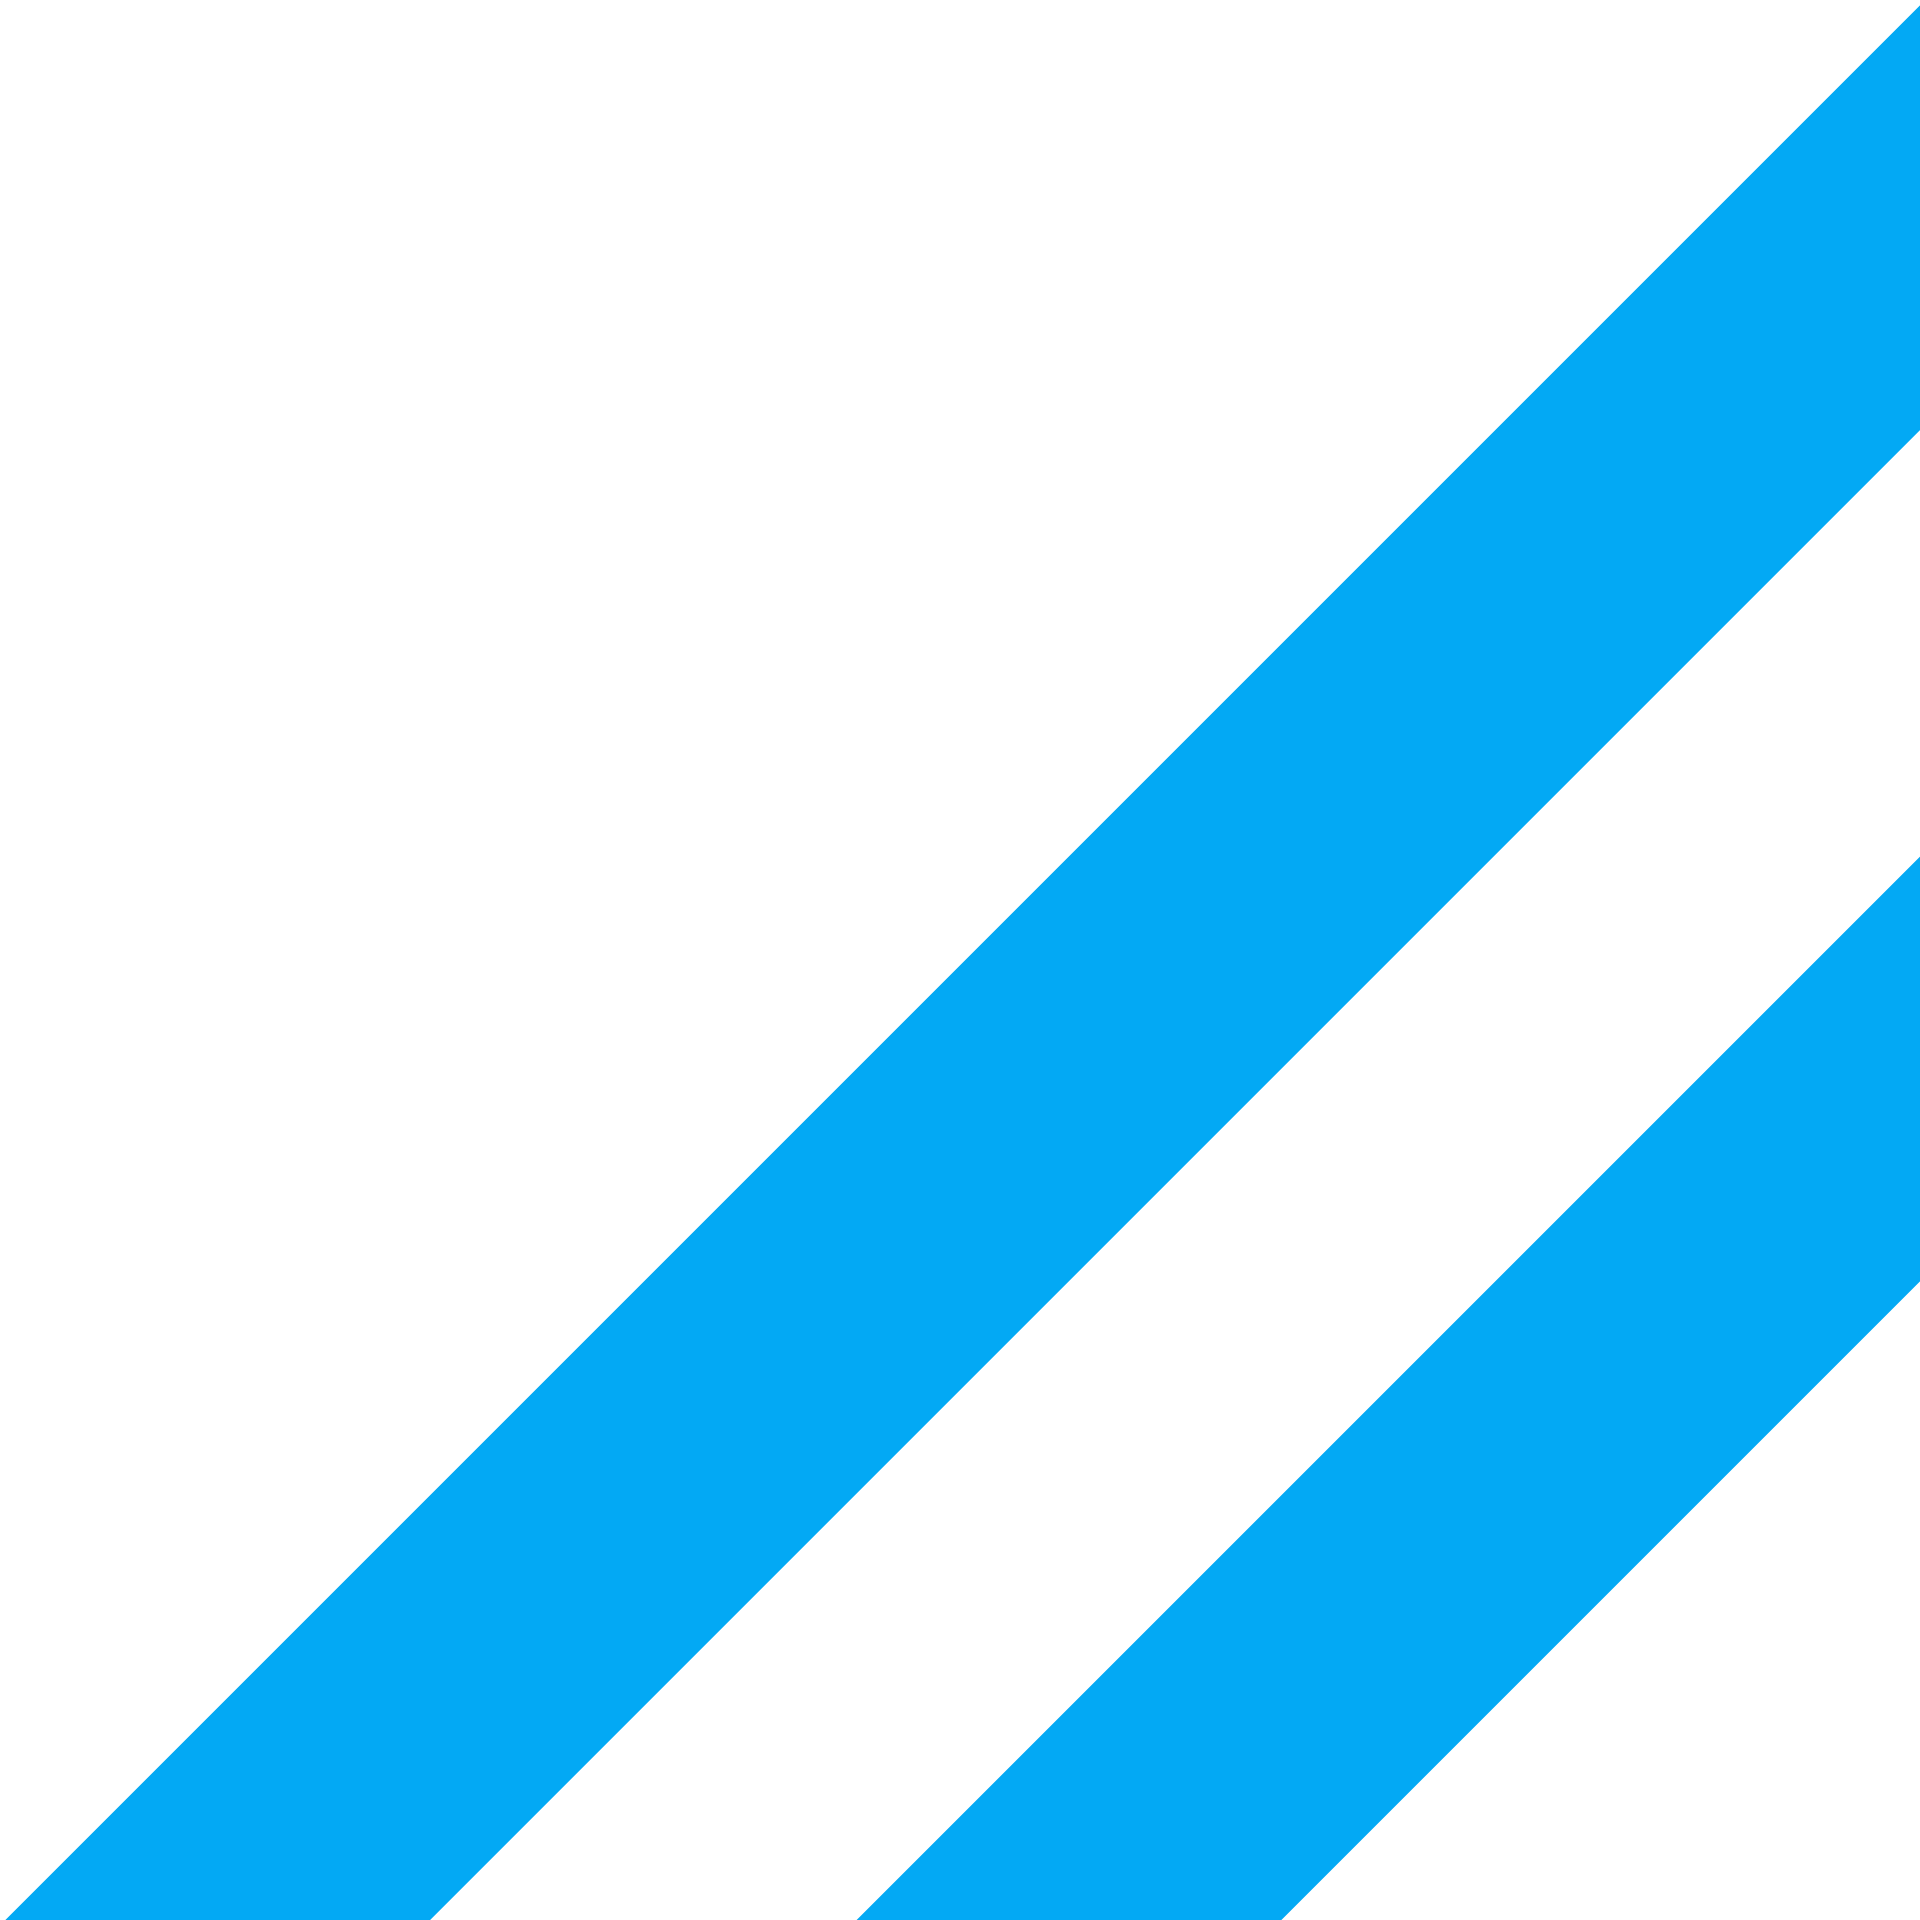 BG Stripes Blue